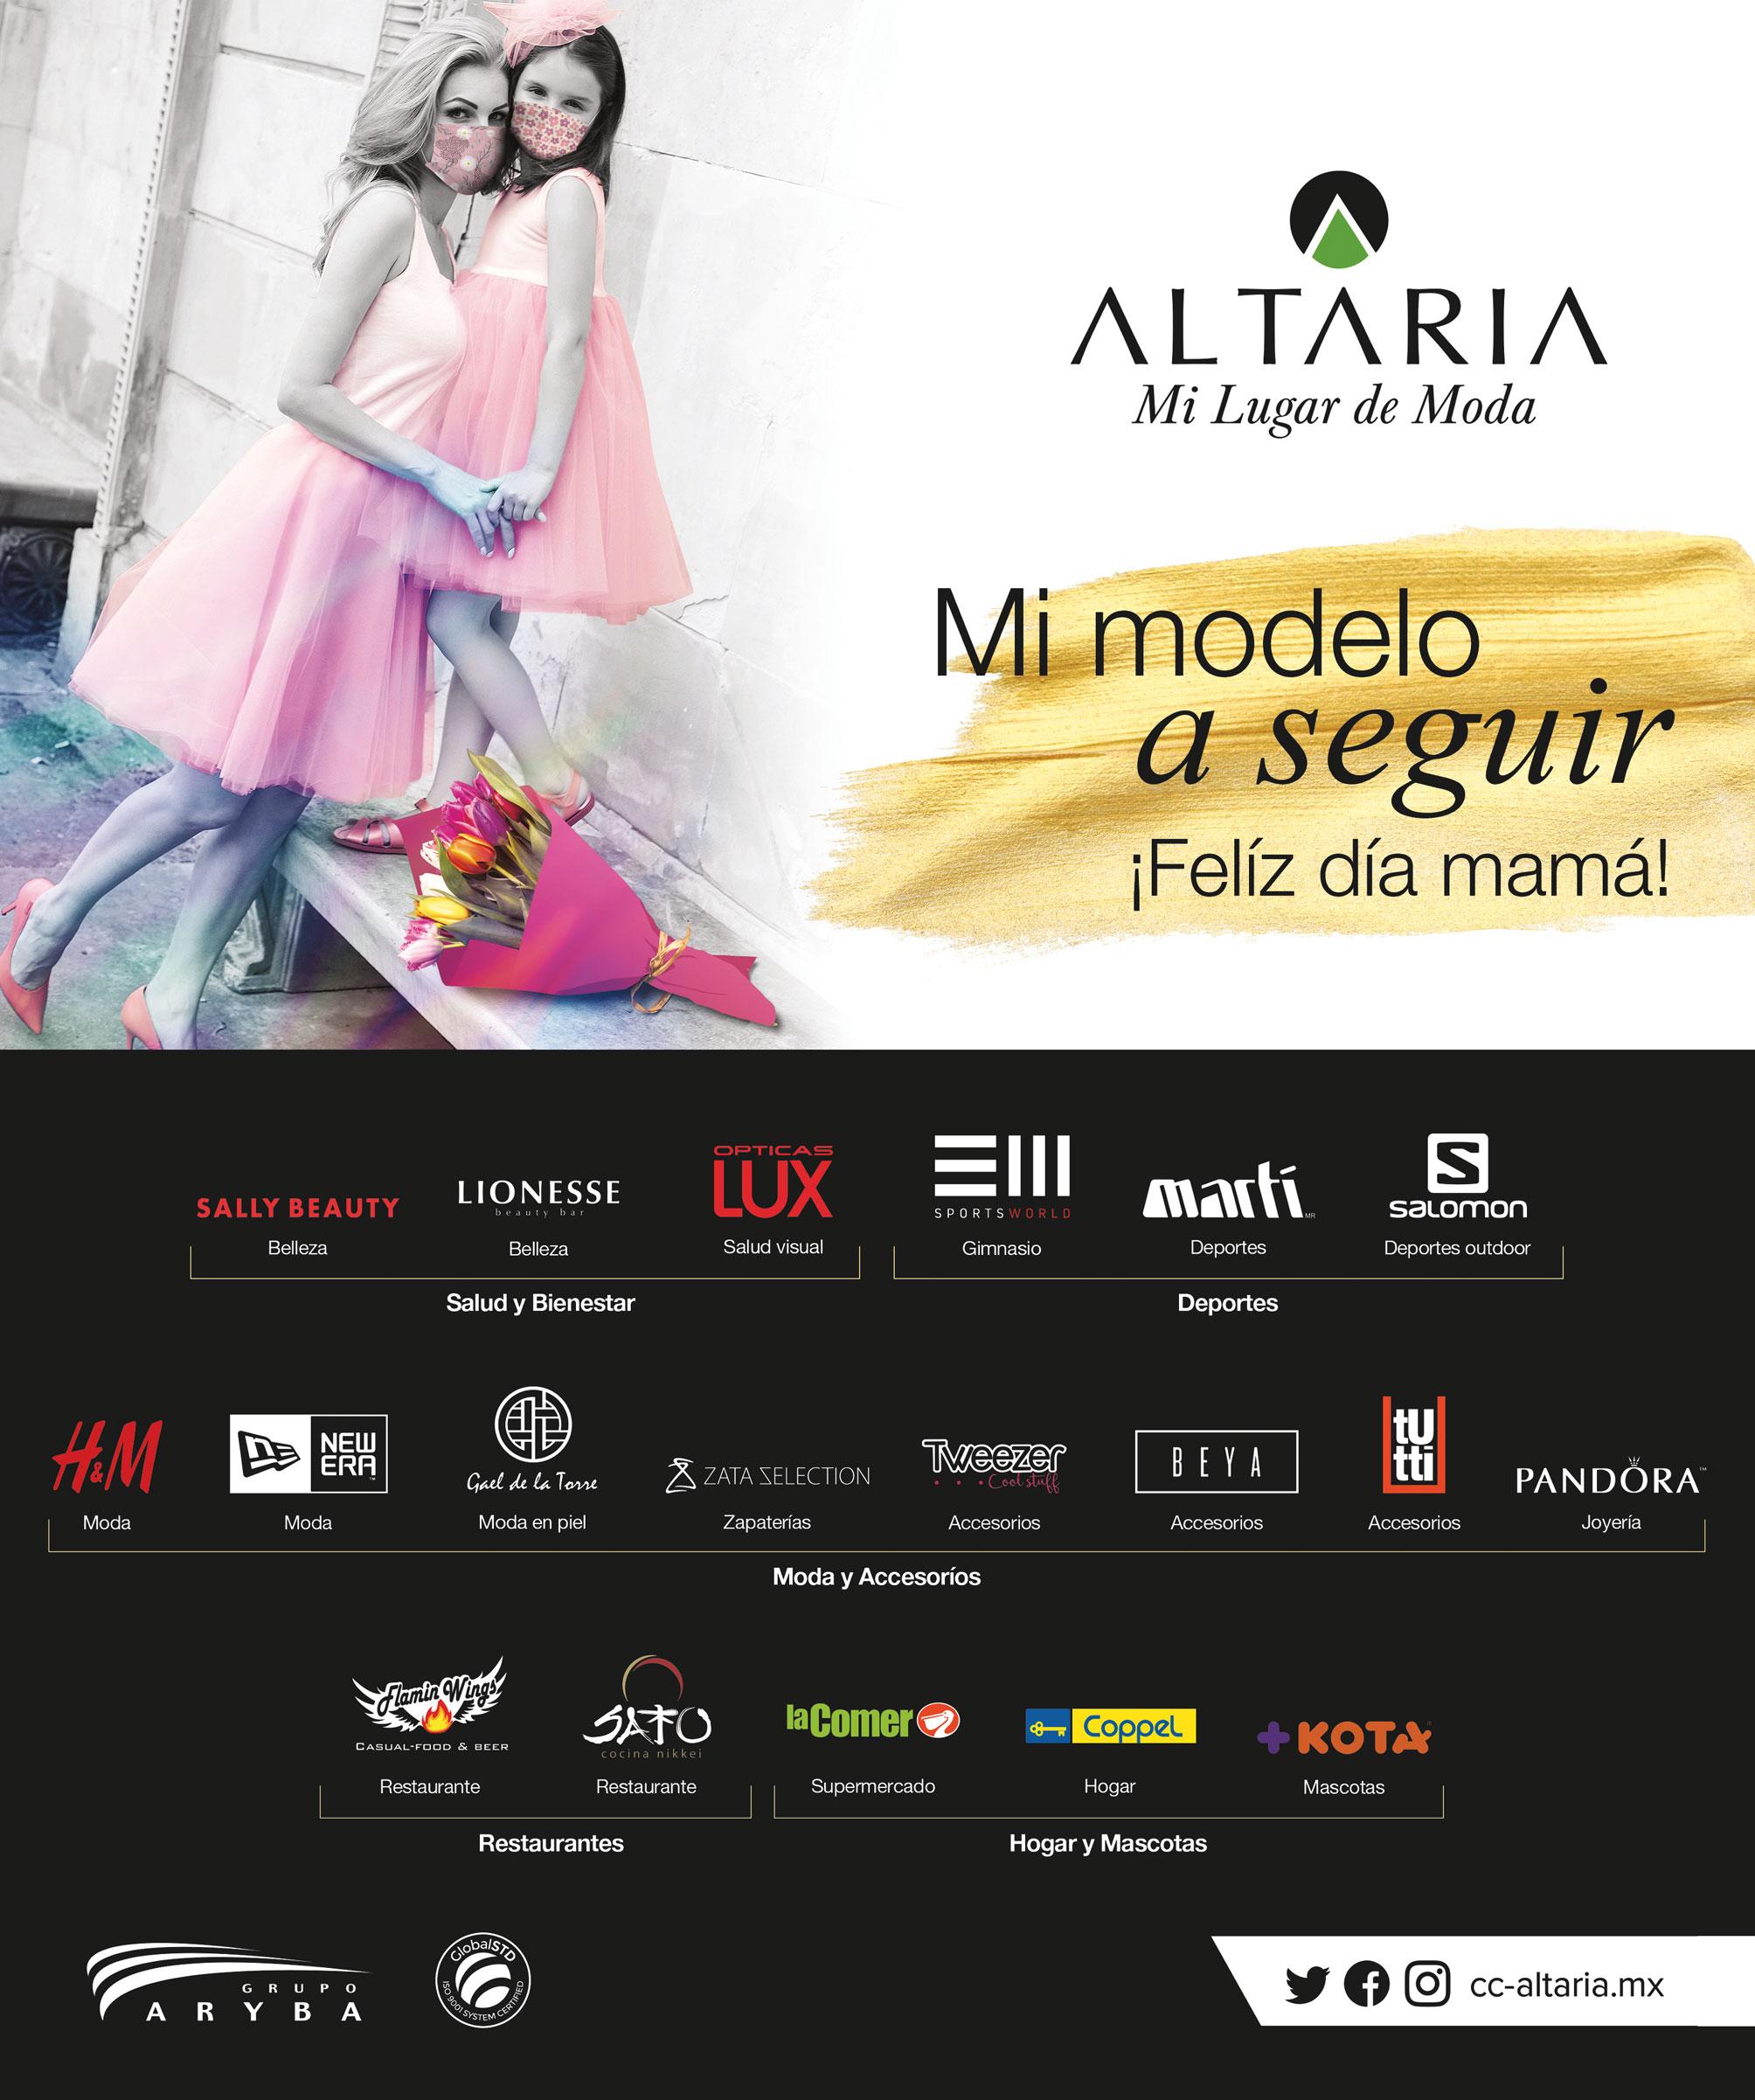 ALTARIA-OK